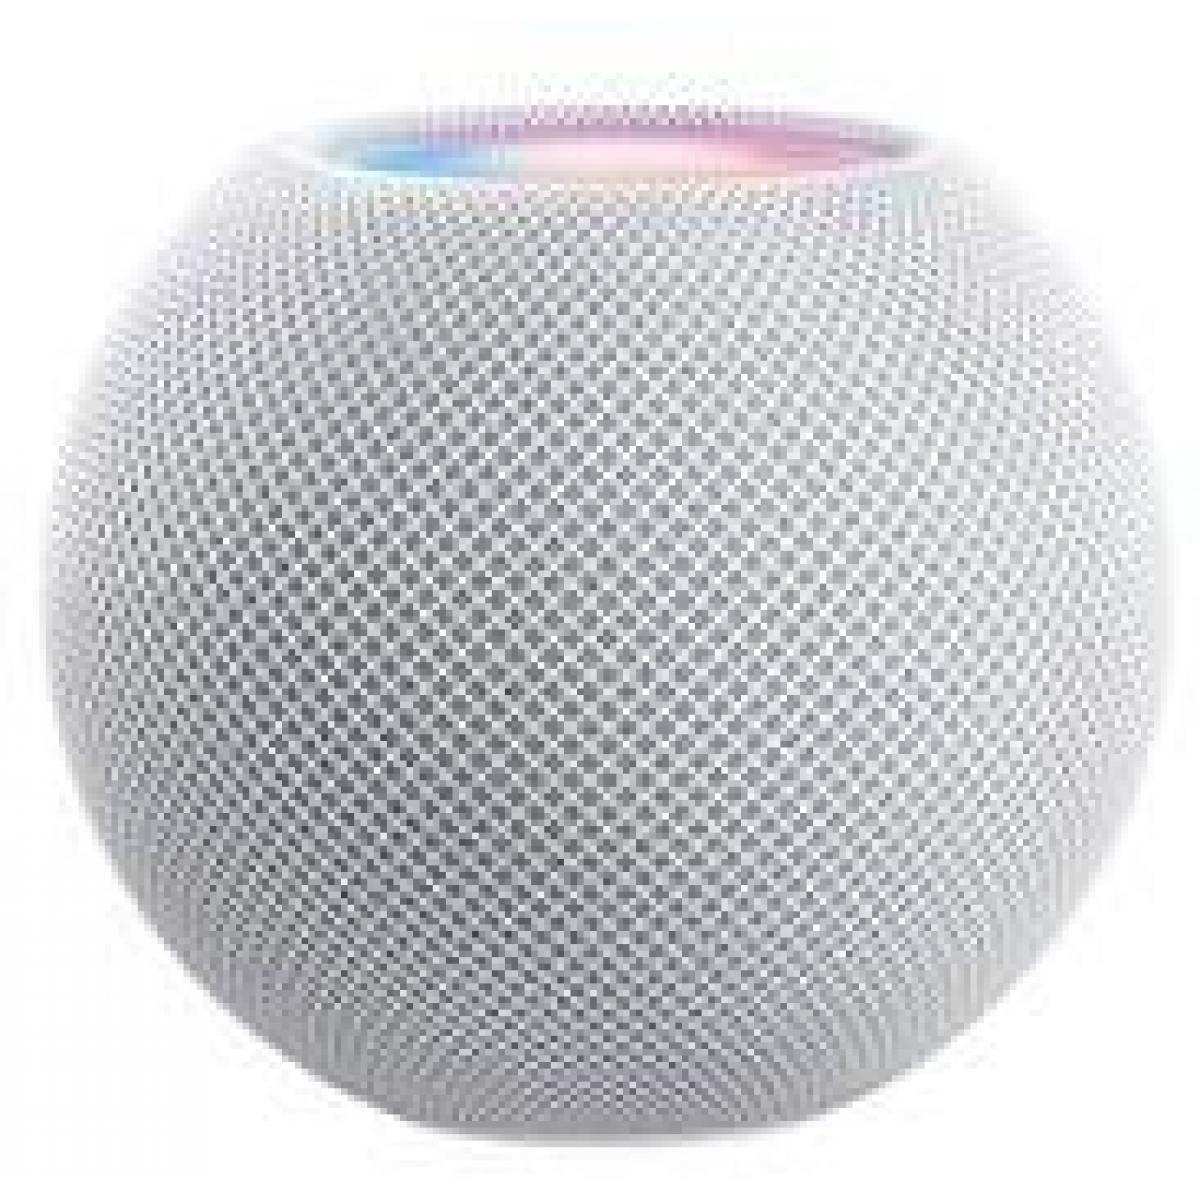 An Apple Homepod Mini in white.